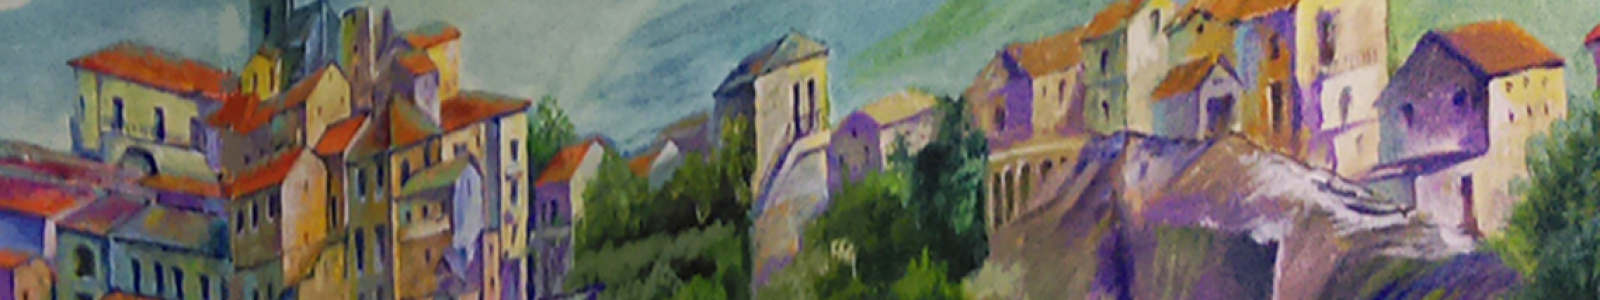 Gallery Painter Svetlana Akulova